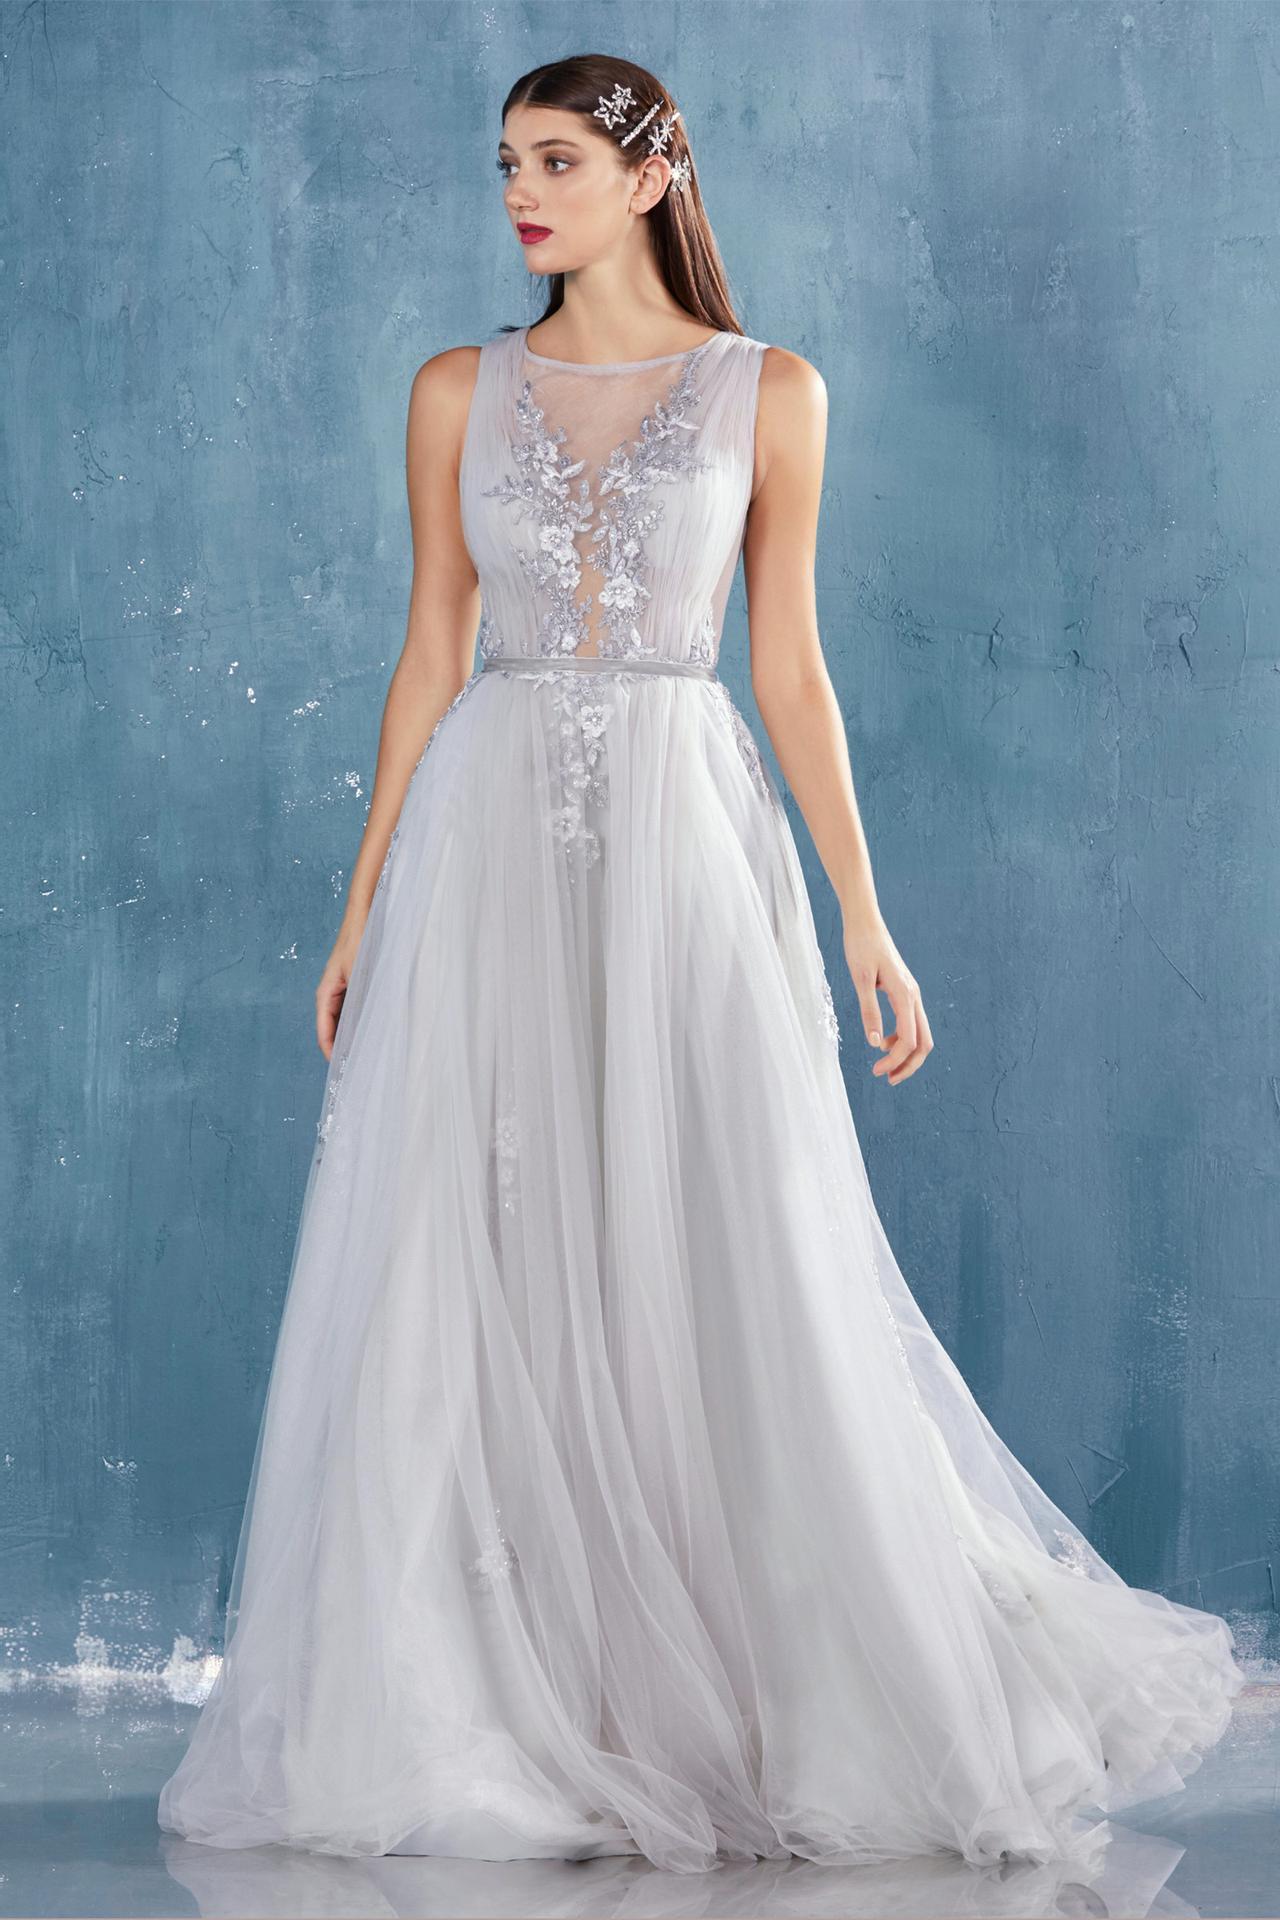 Nové spoločenské šaty :) - Obrázok č. 38